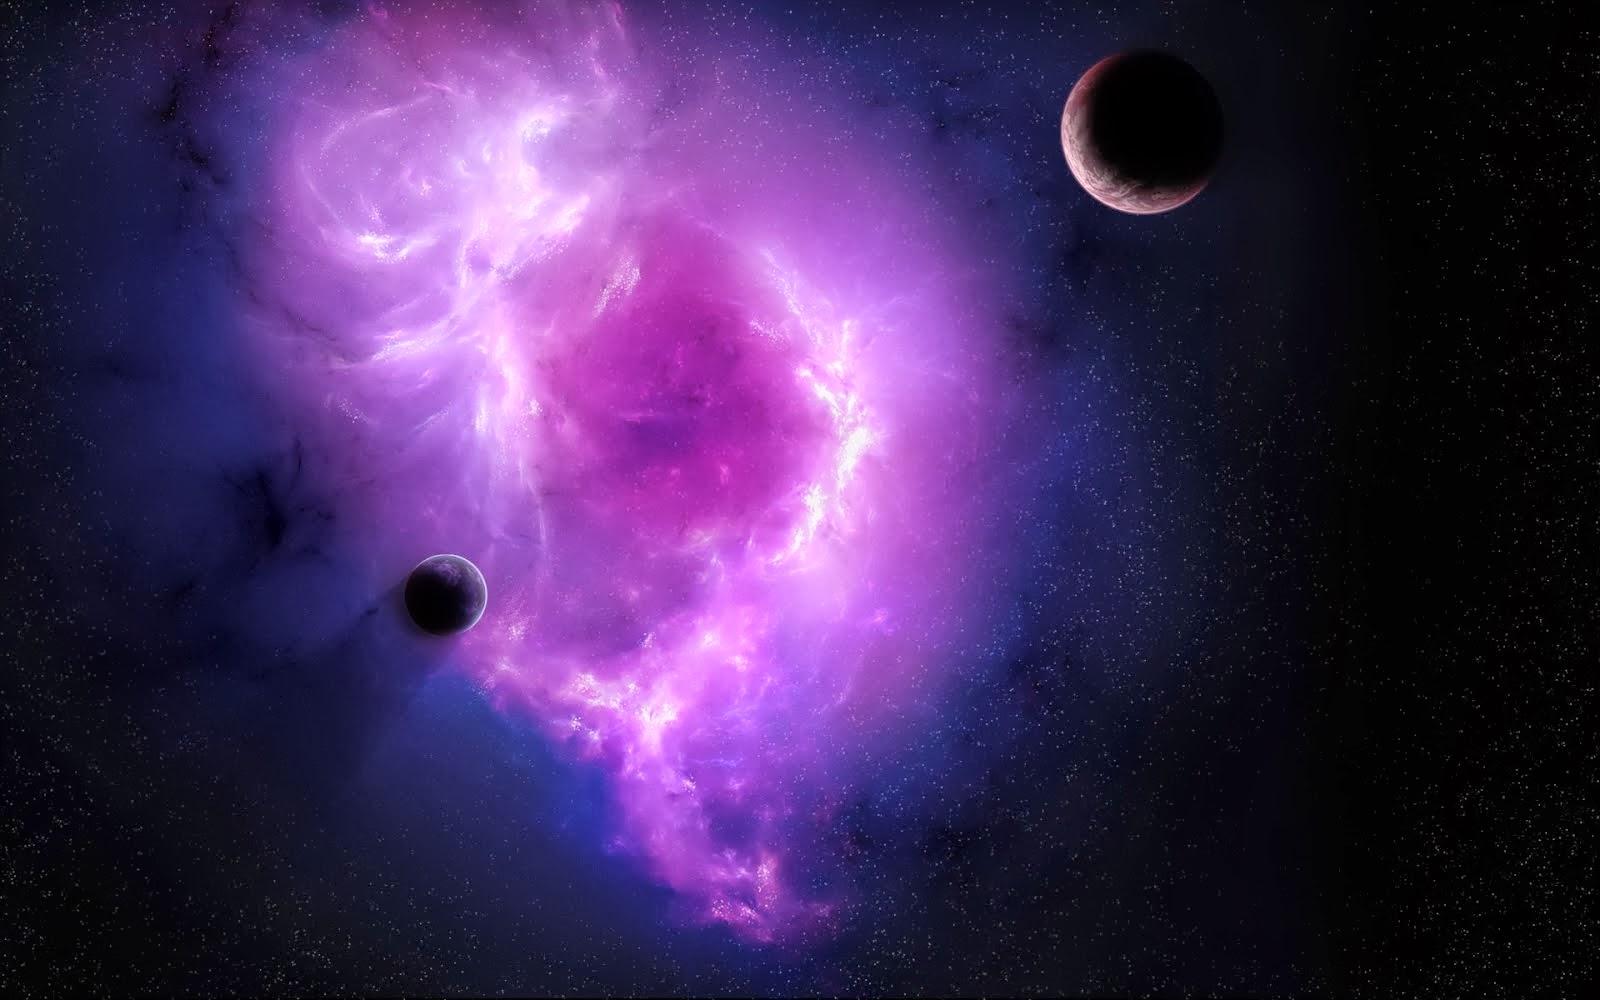 Space nebula wallpaper space wallpaper - Spacey wallpaper ...